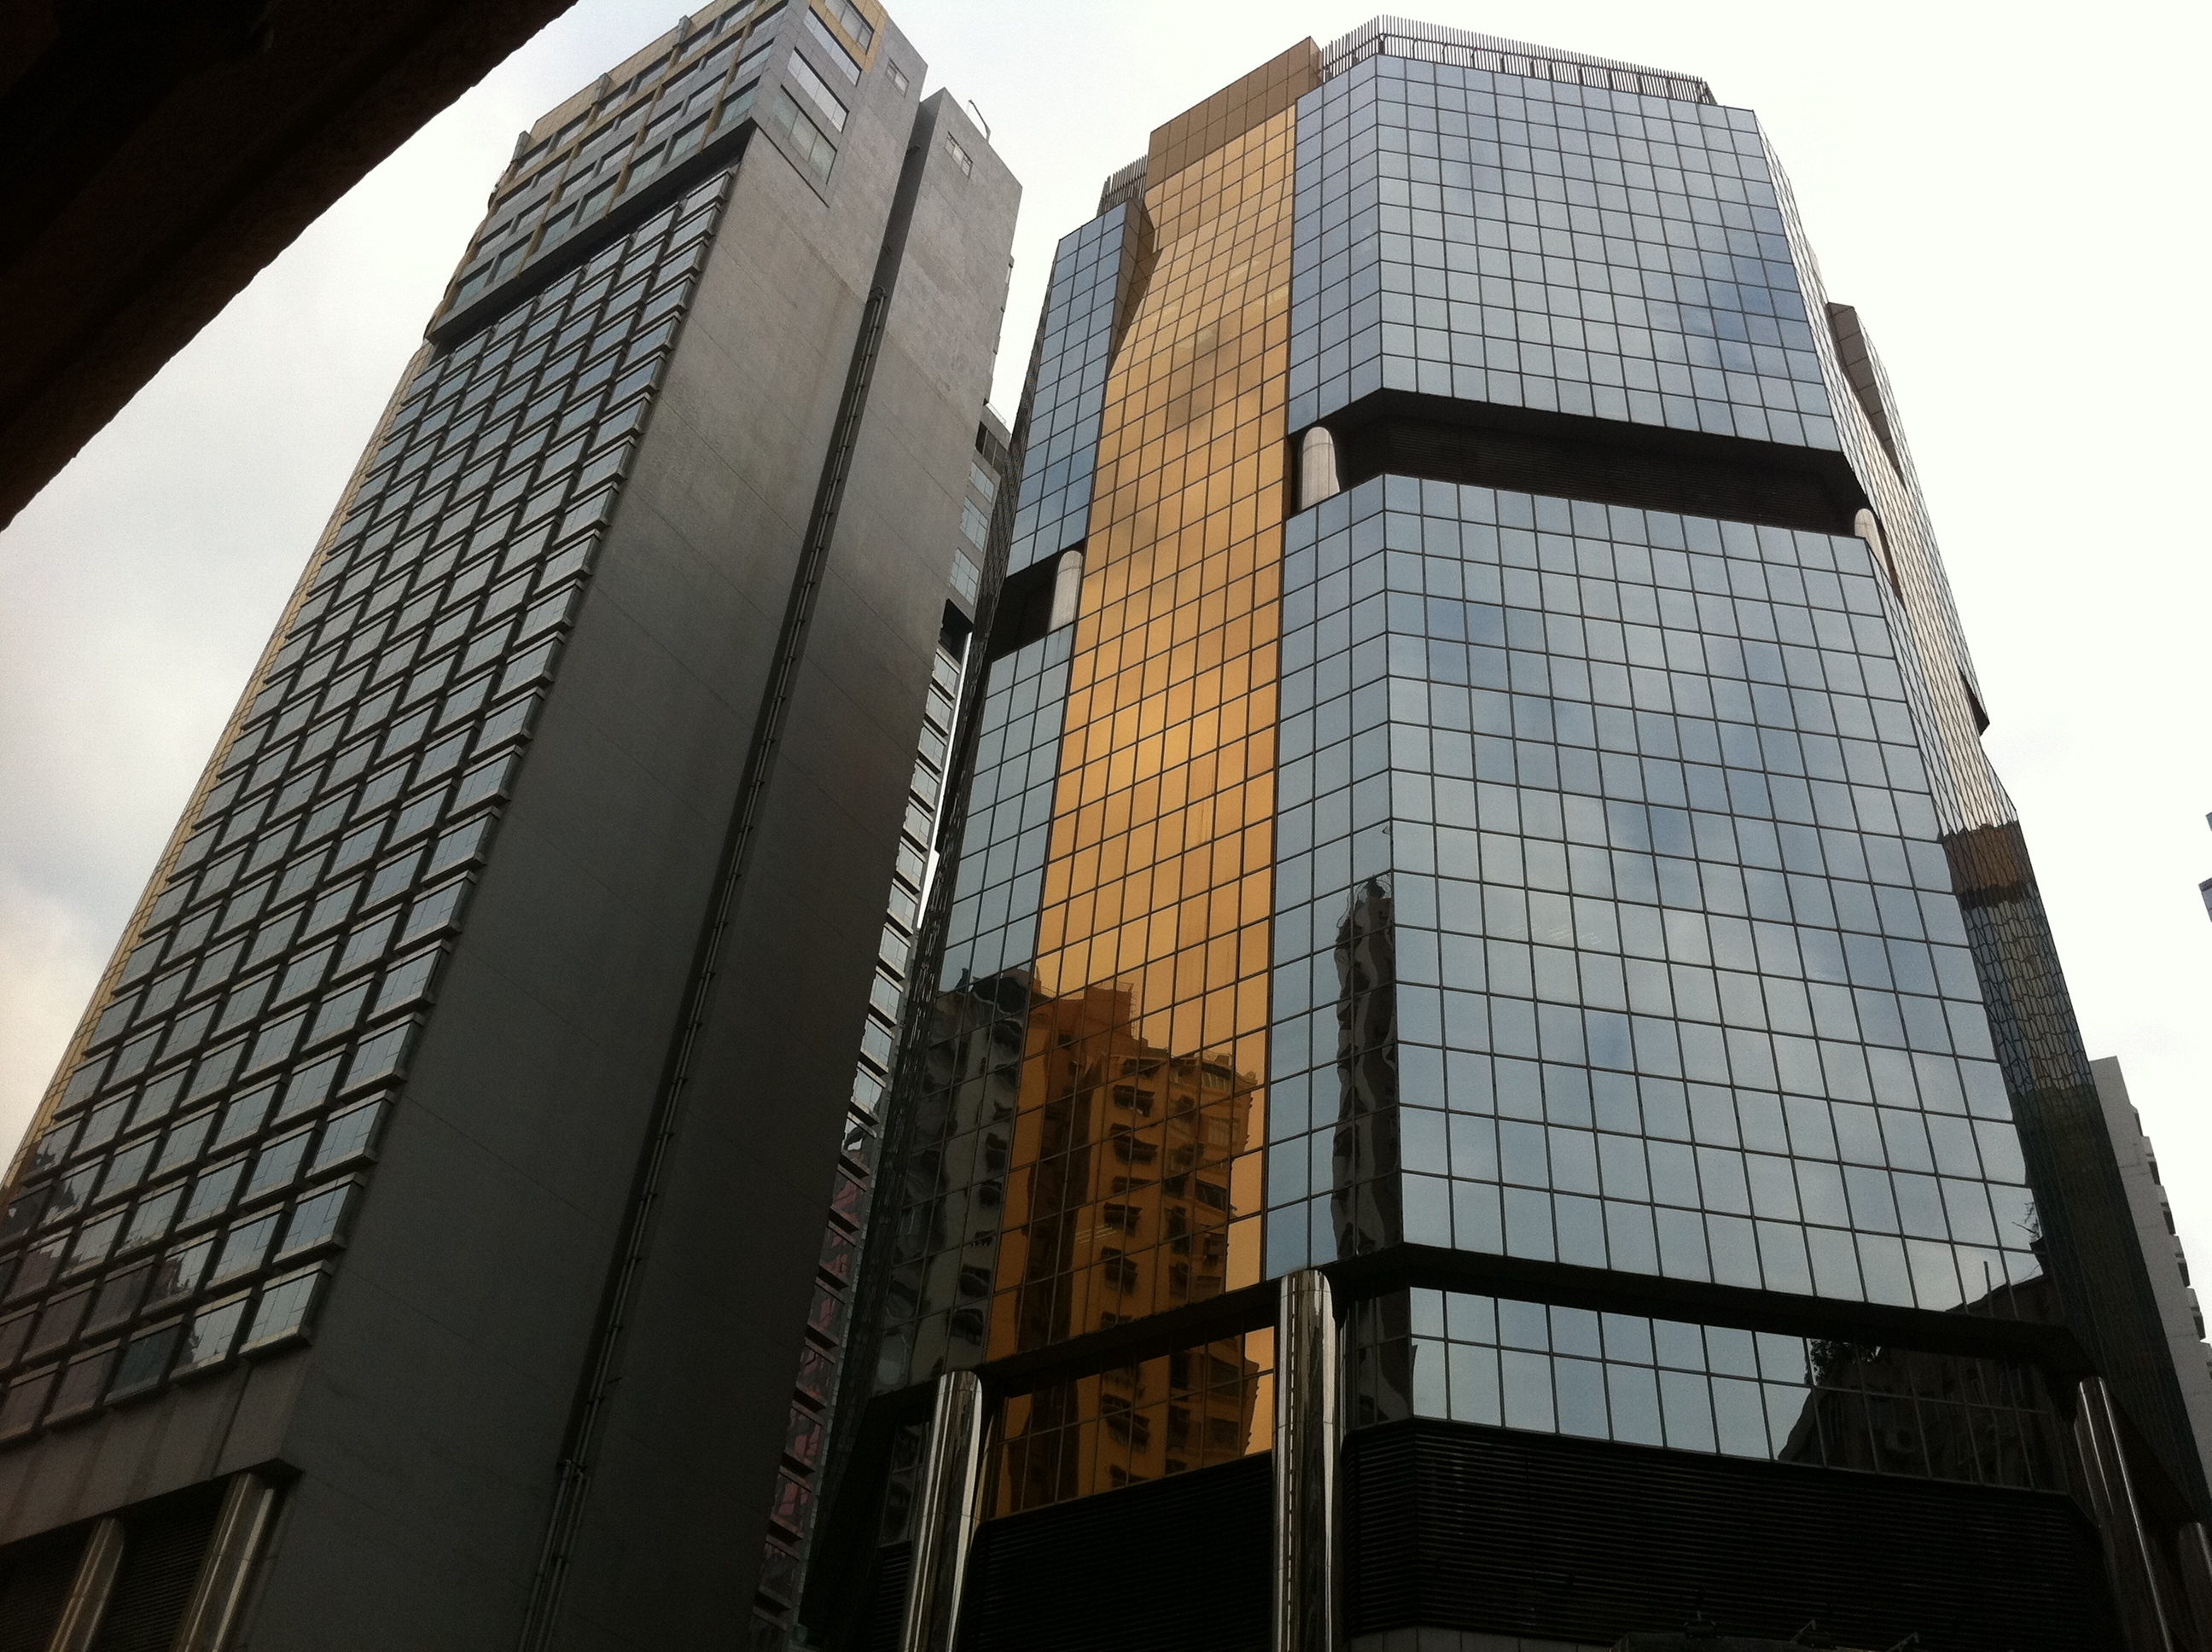 office building facades. File:HK CWB Yee Wo Street Hotel \u0026 Office Building Facades Jan-2013.